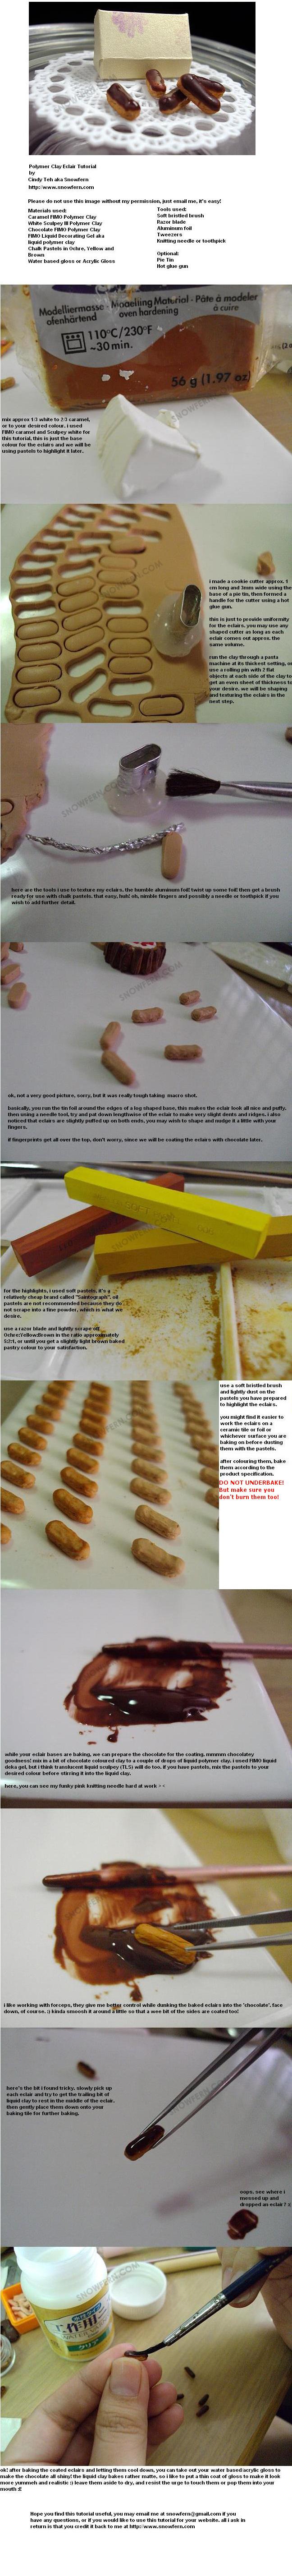 Polymer Clay Eclair Tutorial